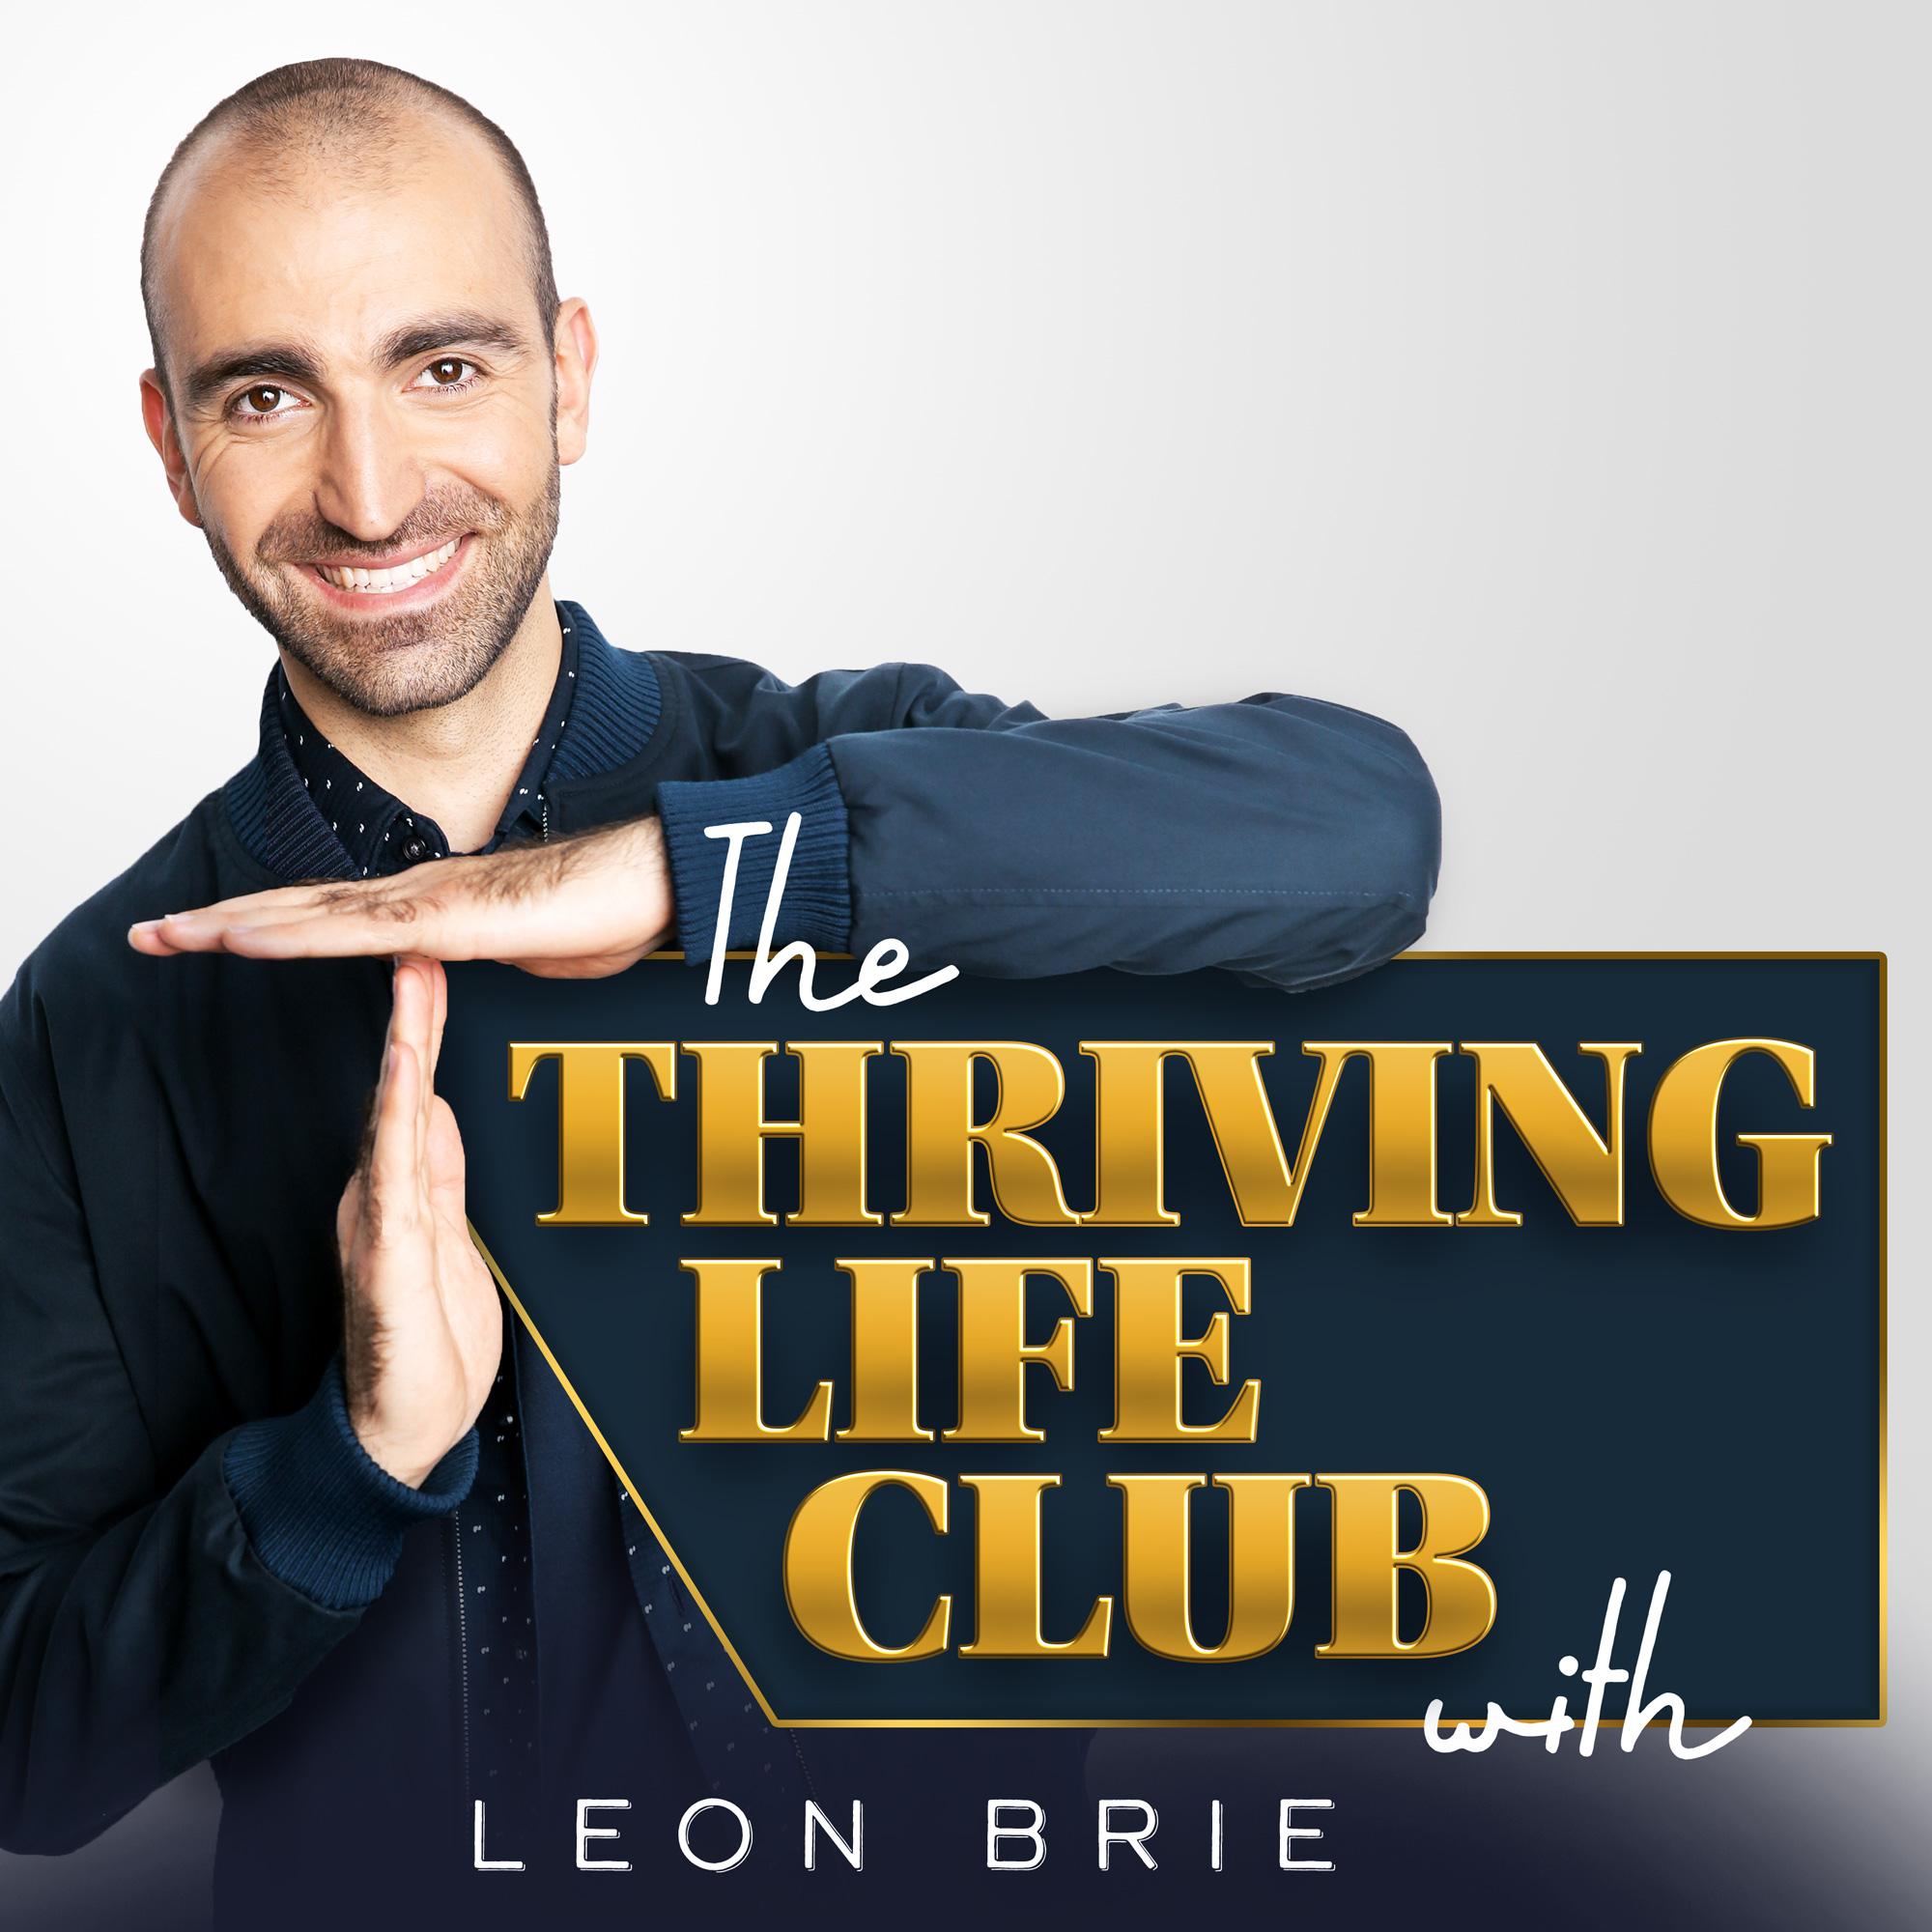 The Thriving Life Club